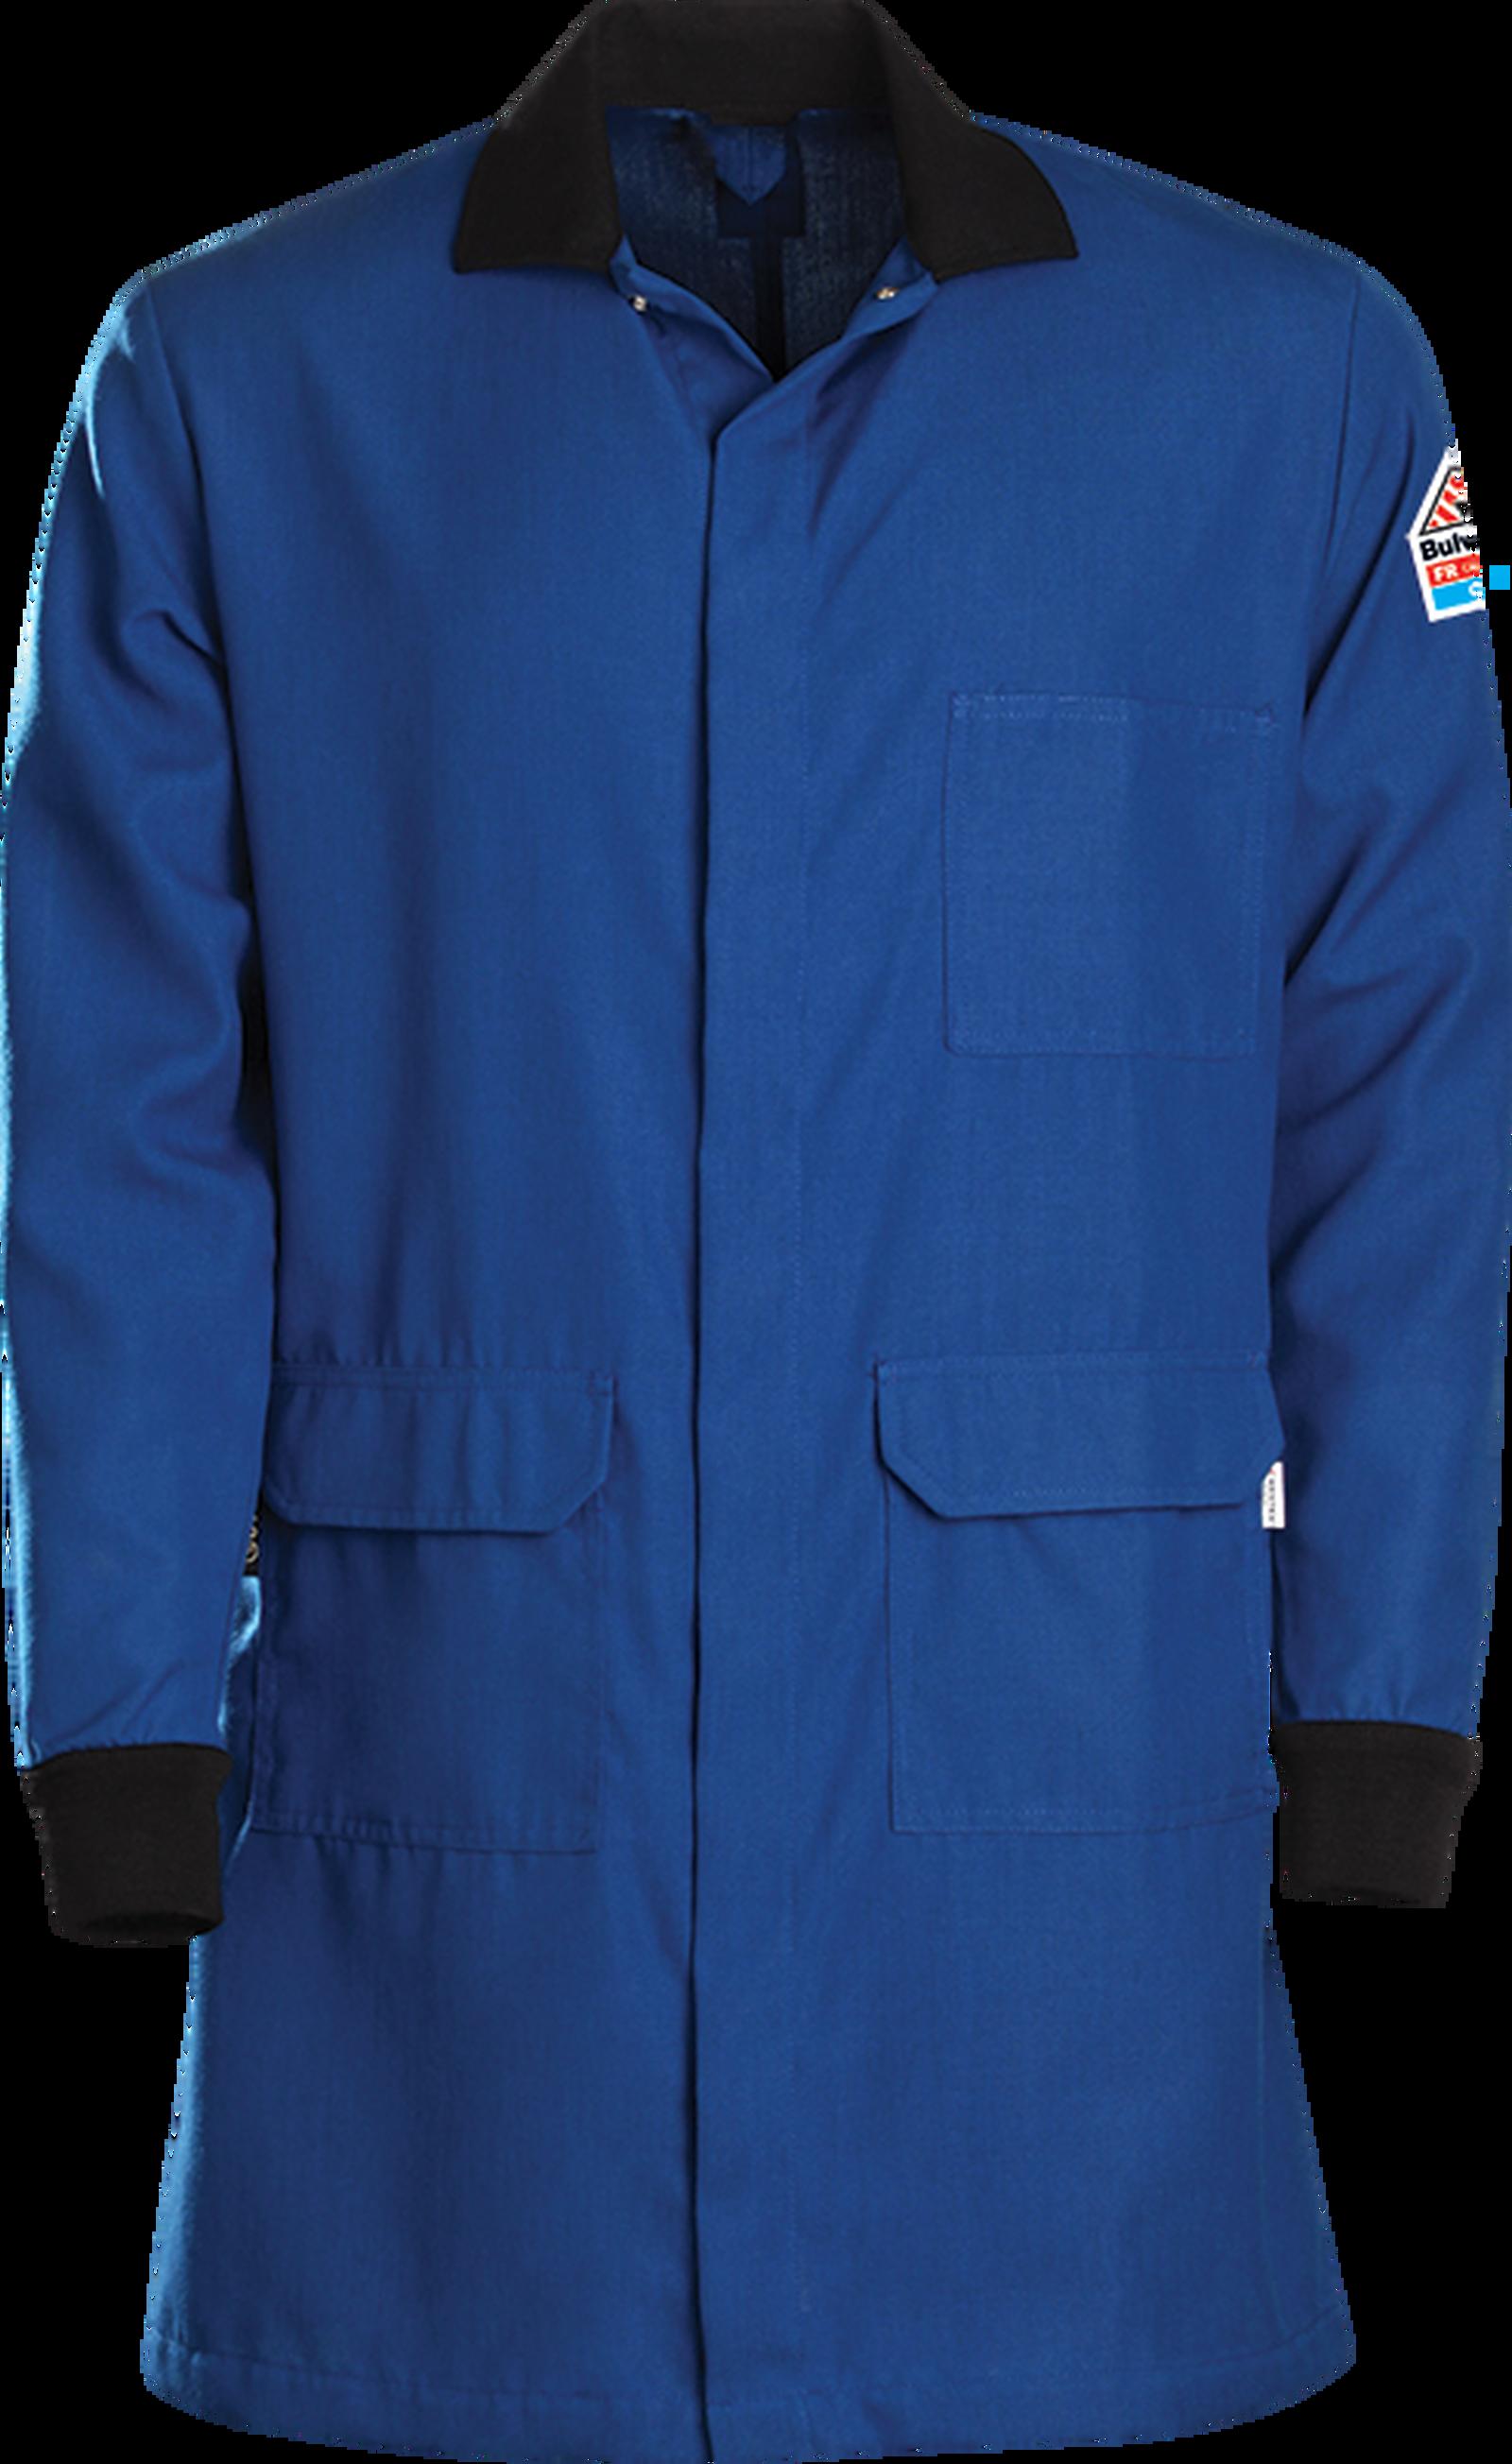 Men's Nomex FR/CP Lab Coat